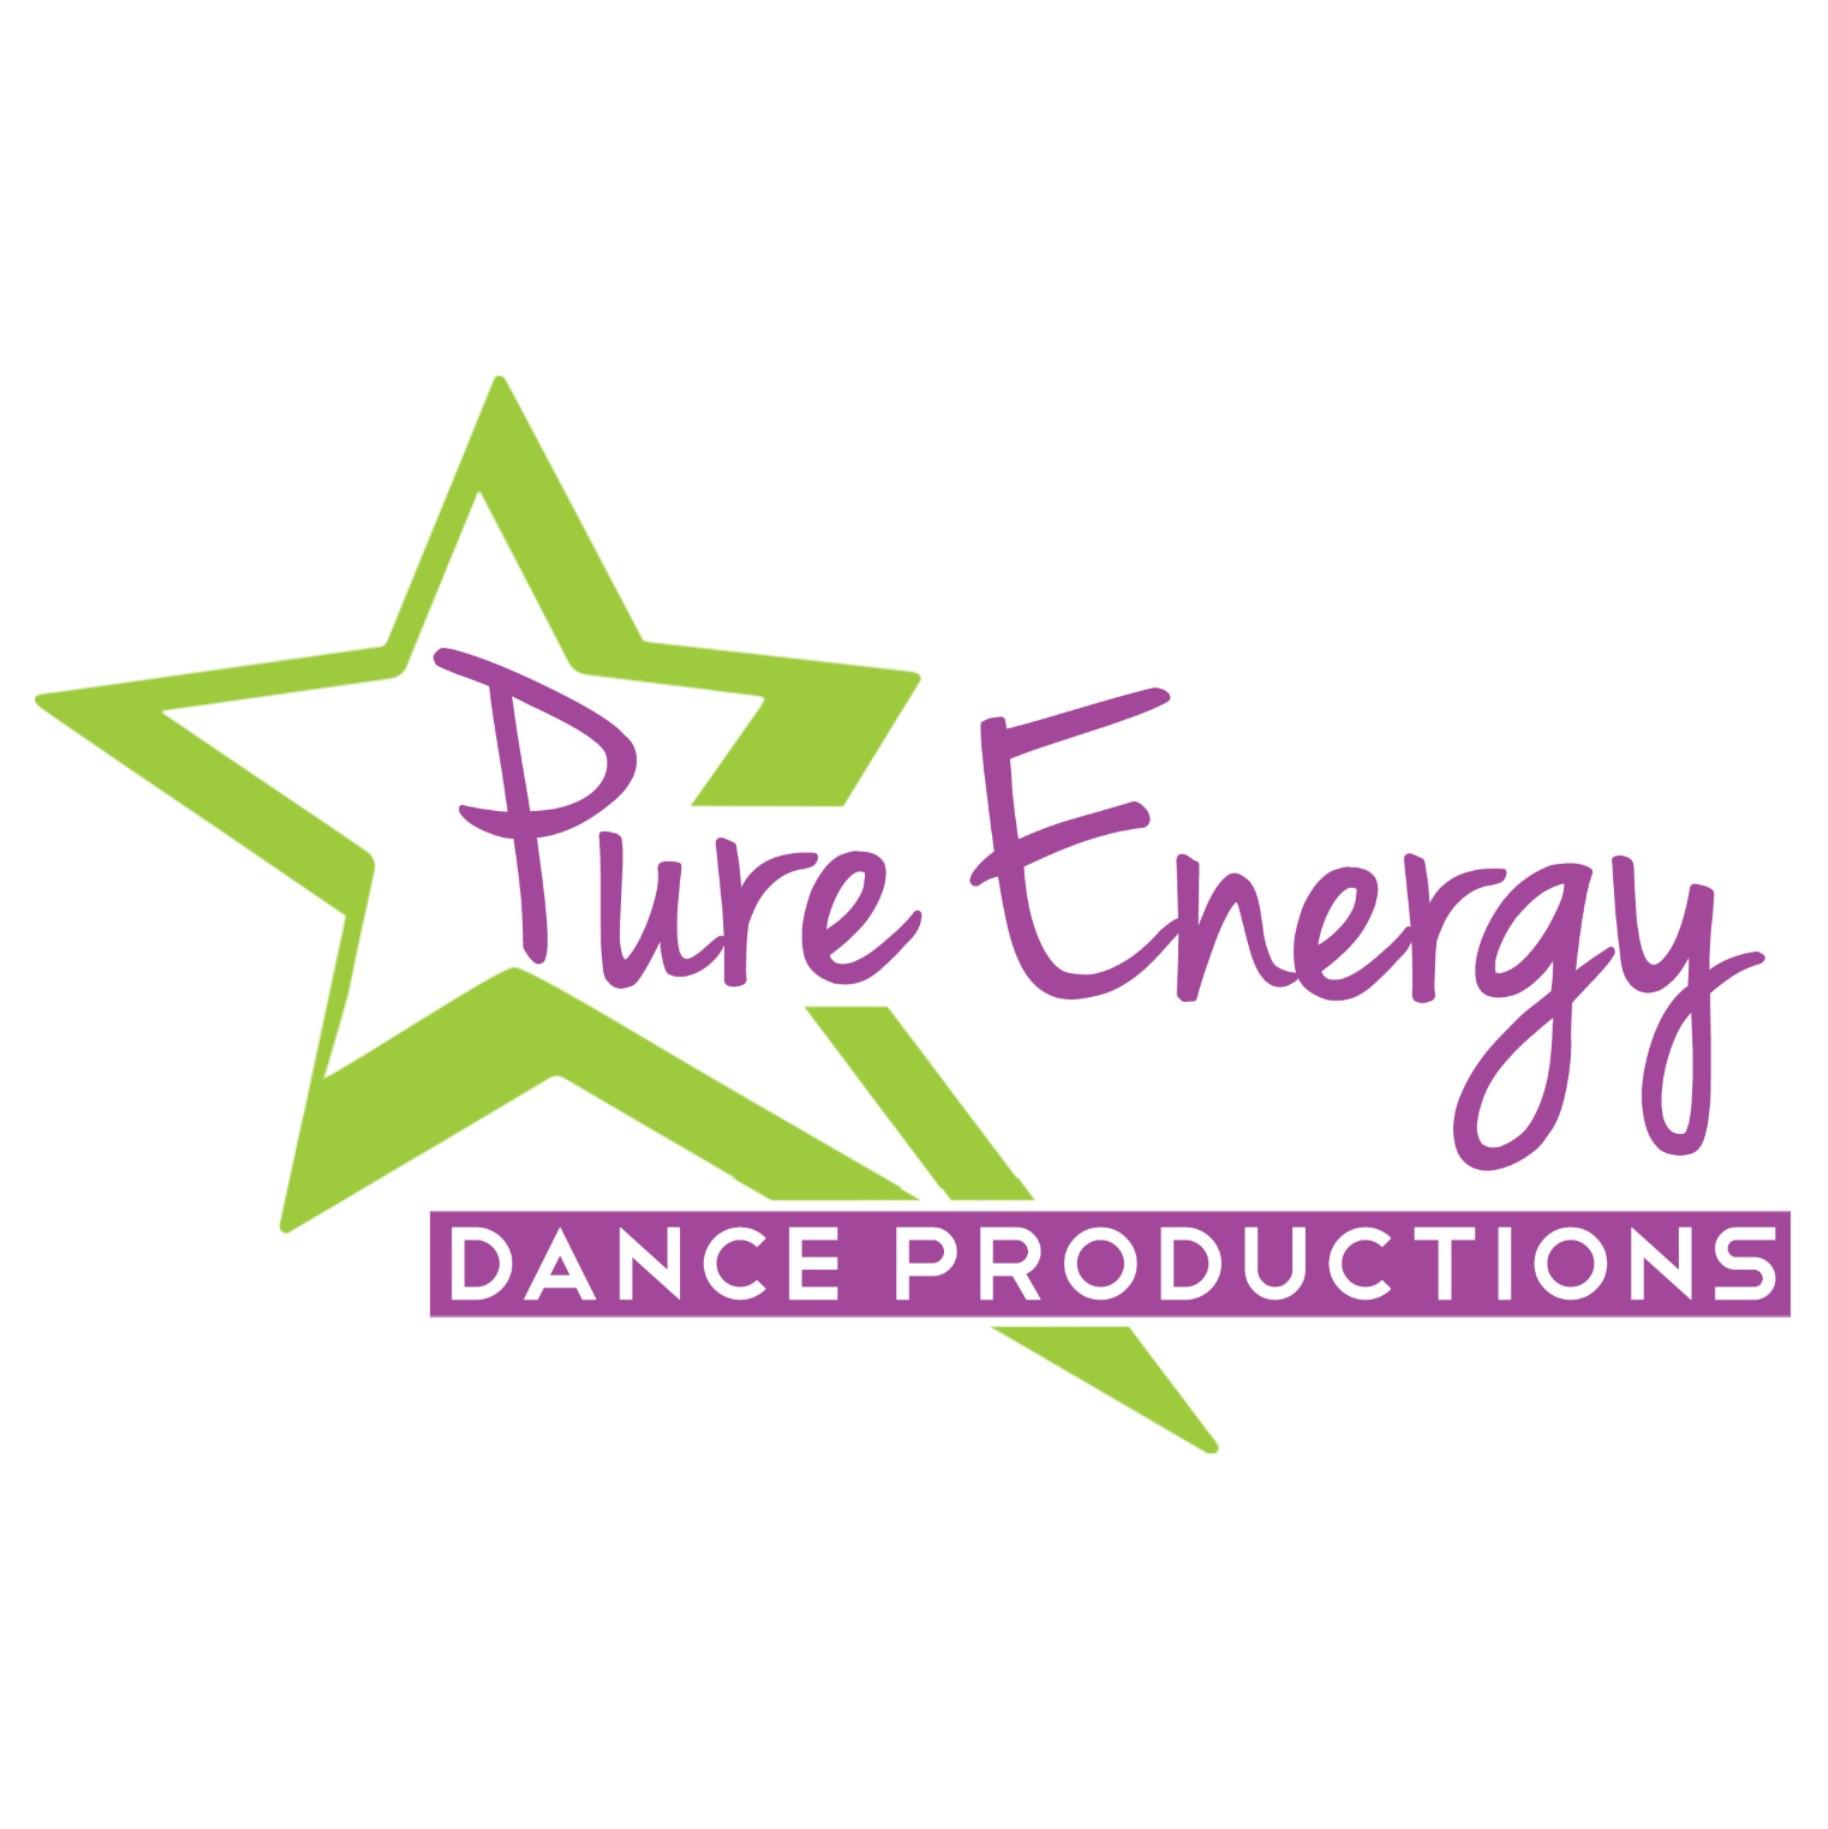 Dance studio teaching dance classes in bryan college station texas